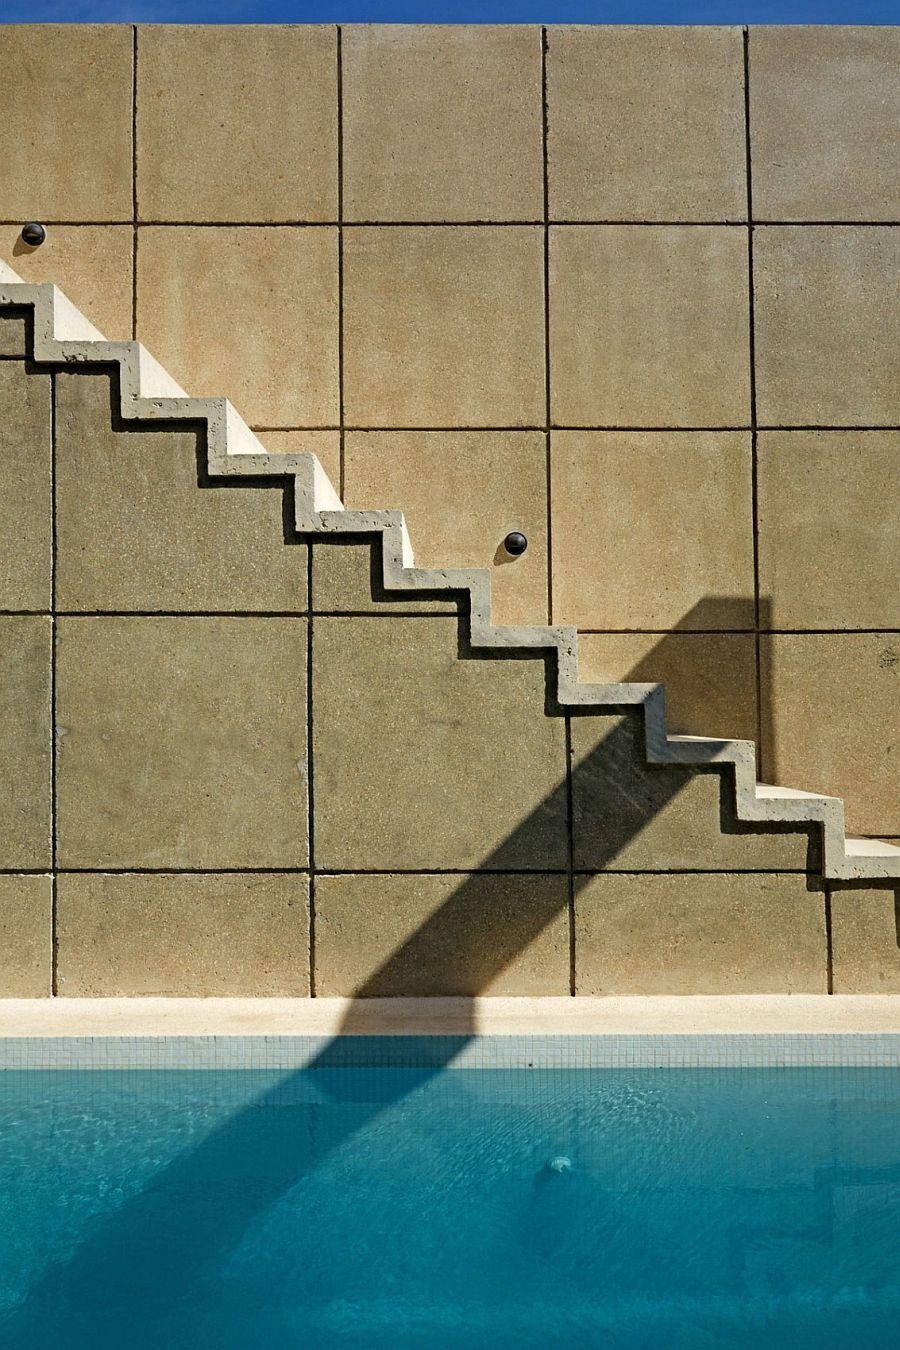 Minimal staircase design next to the concrete wall